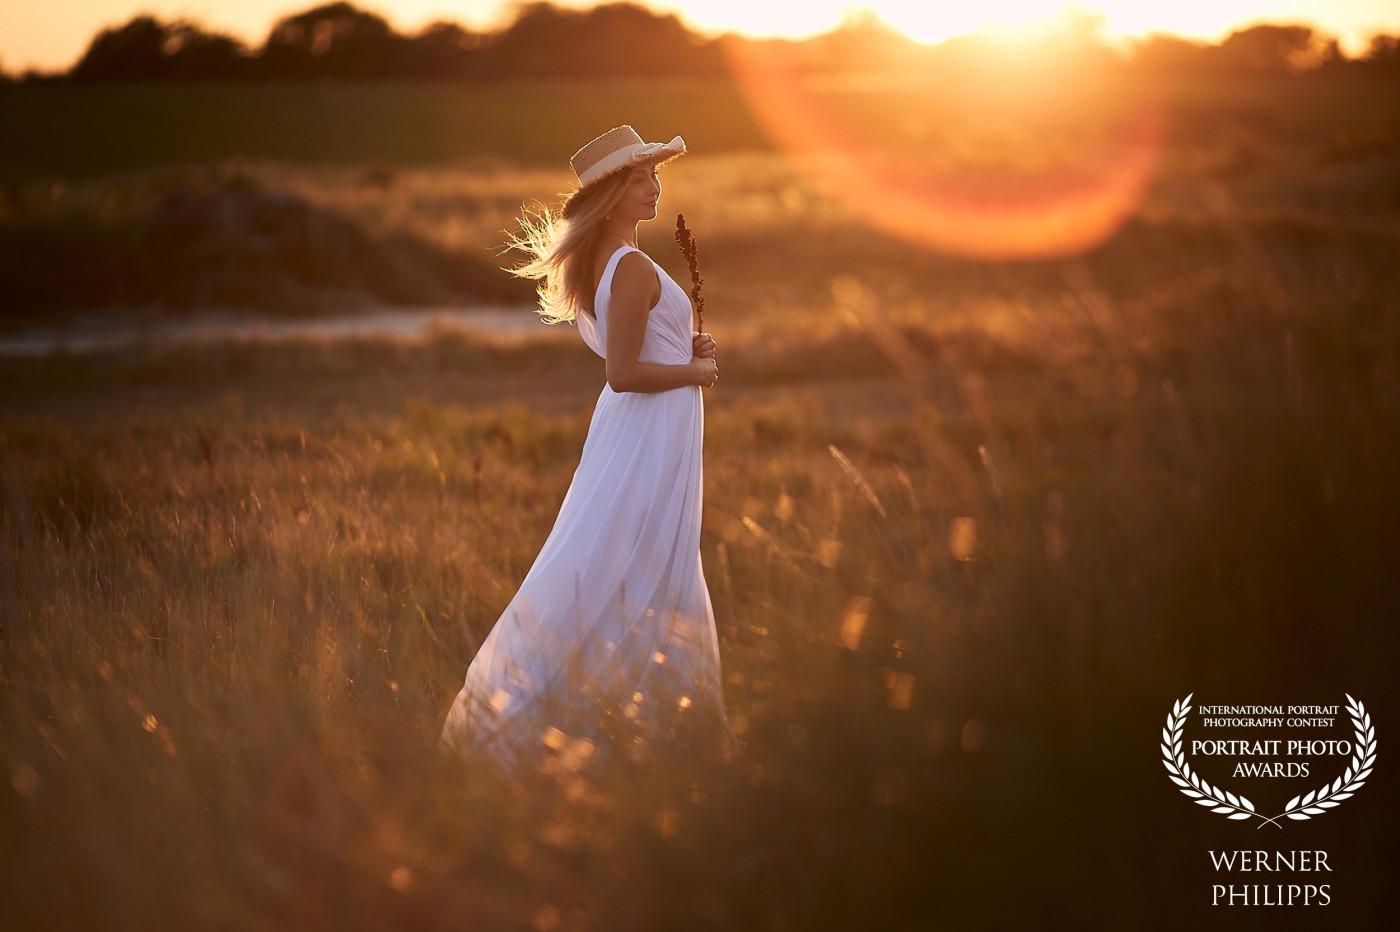 Frau bei Sonnenuntergang in Schillig